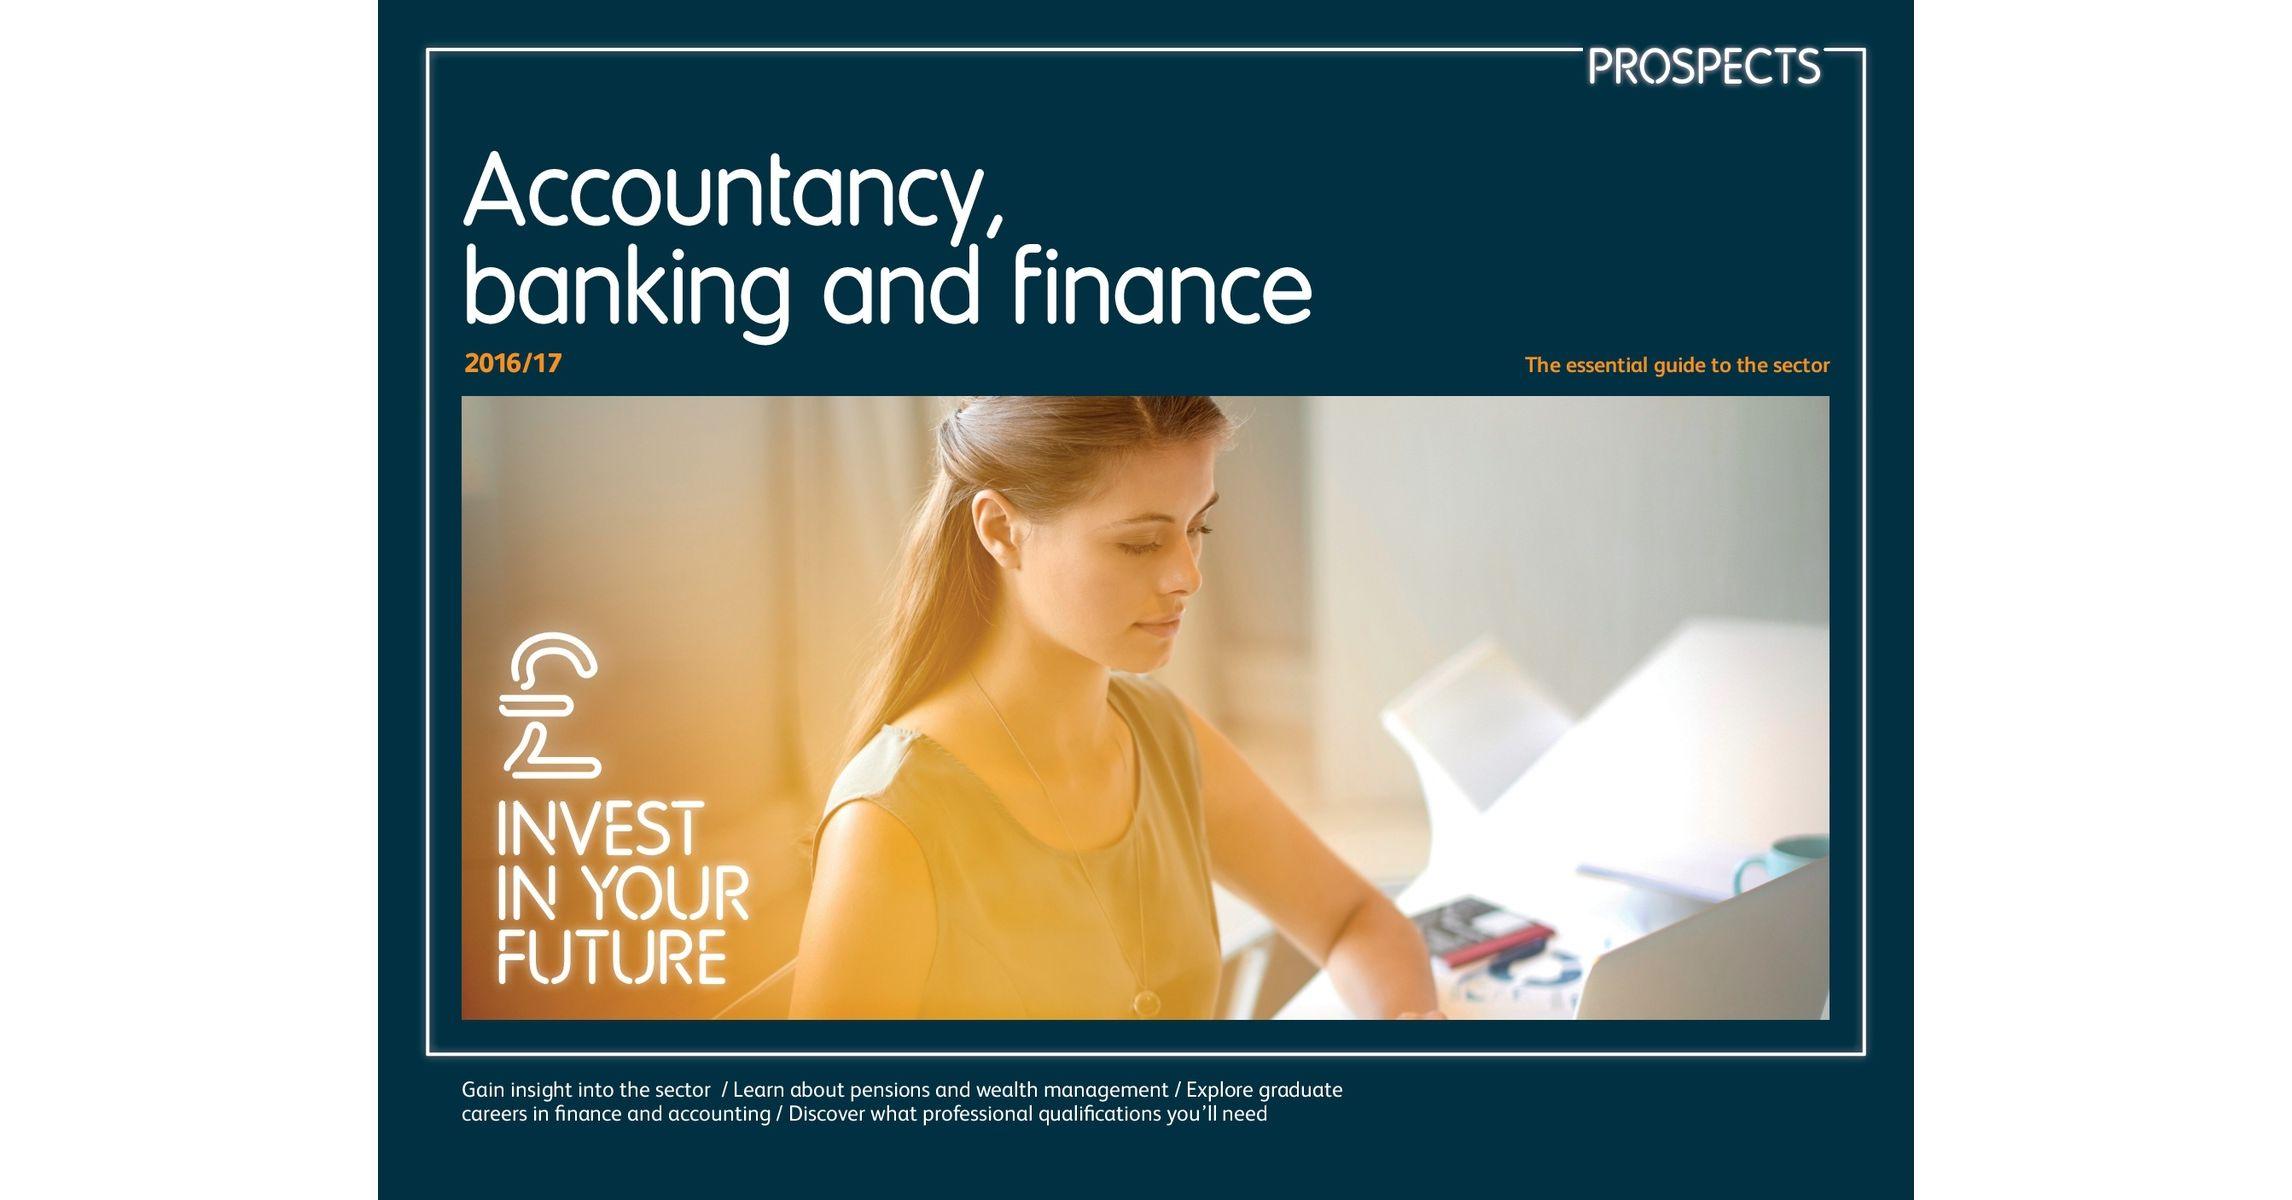 Accountancy Job Prospects